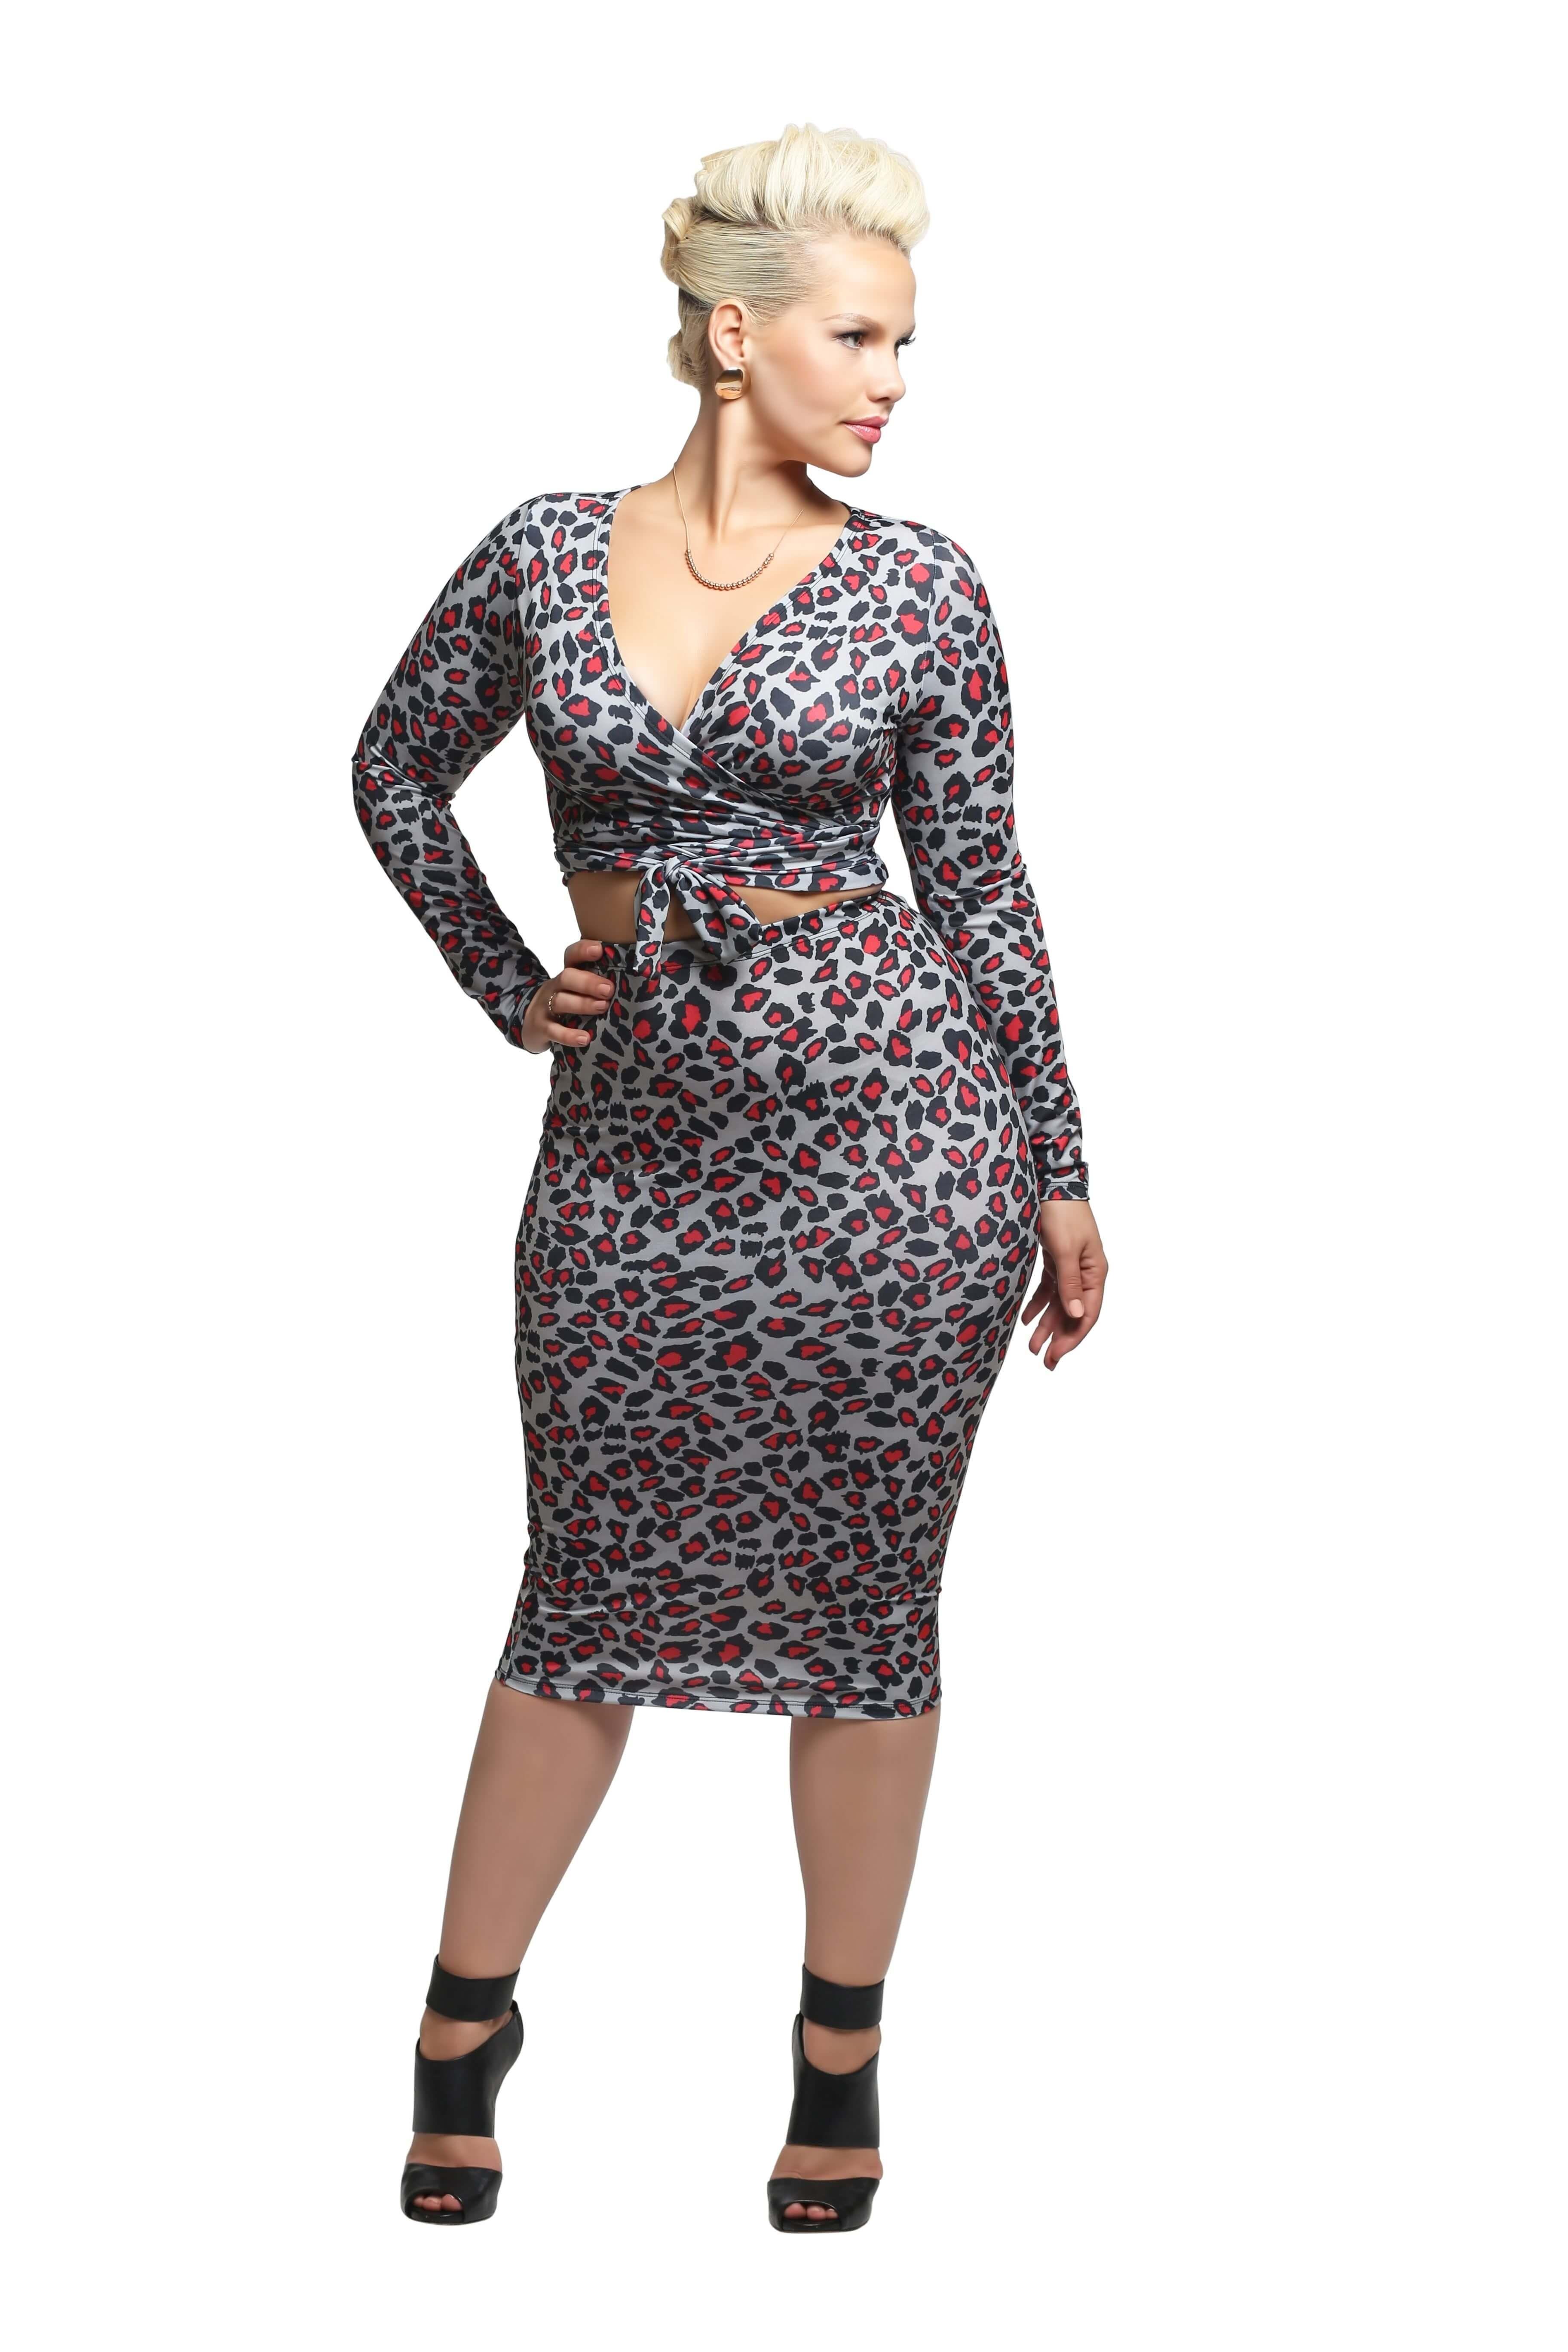 'Felicity' Midi Skirt - Spotty Gray Red Cheetah